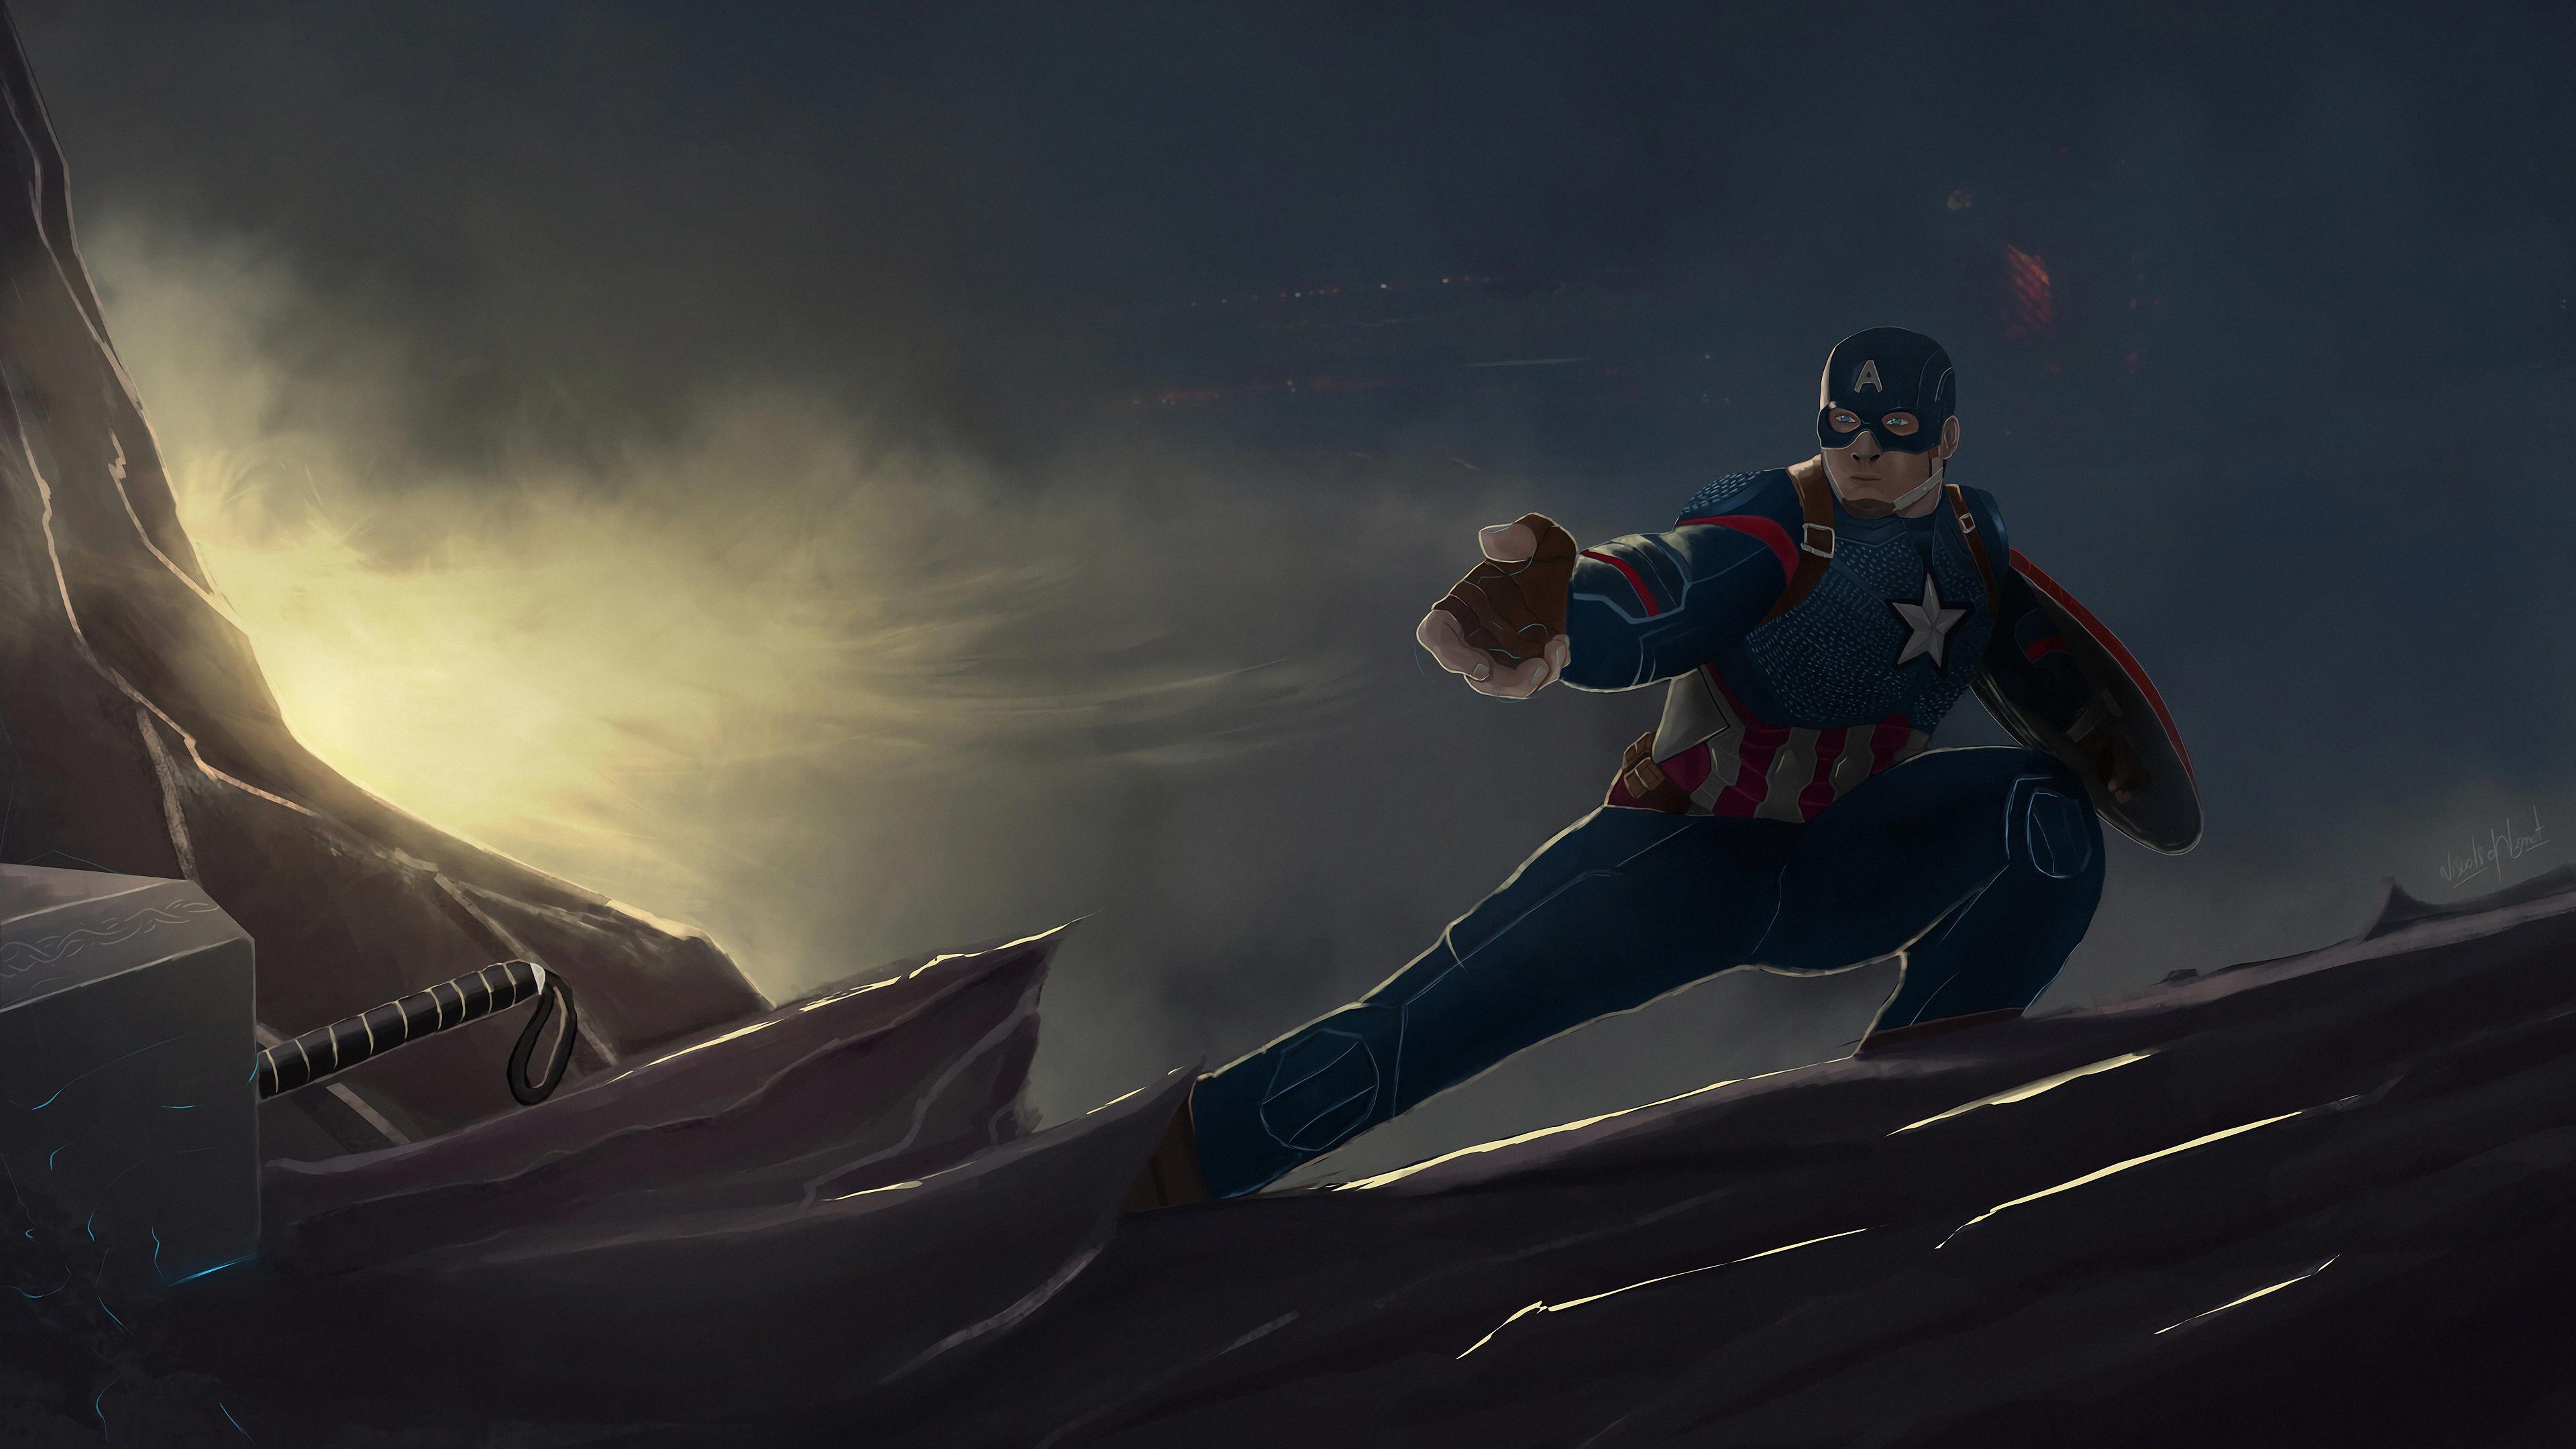 captain america mjolnir and shield 1569186552 - Captain America Mjolnir And Shield - superheroes wallpapers, hd-wallpapers, digital art wallpapers, captain america wallpapers, artwork wallpapers, artstation wallpapers, 4k-wallpapers